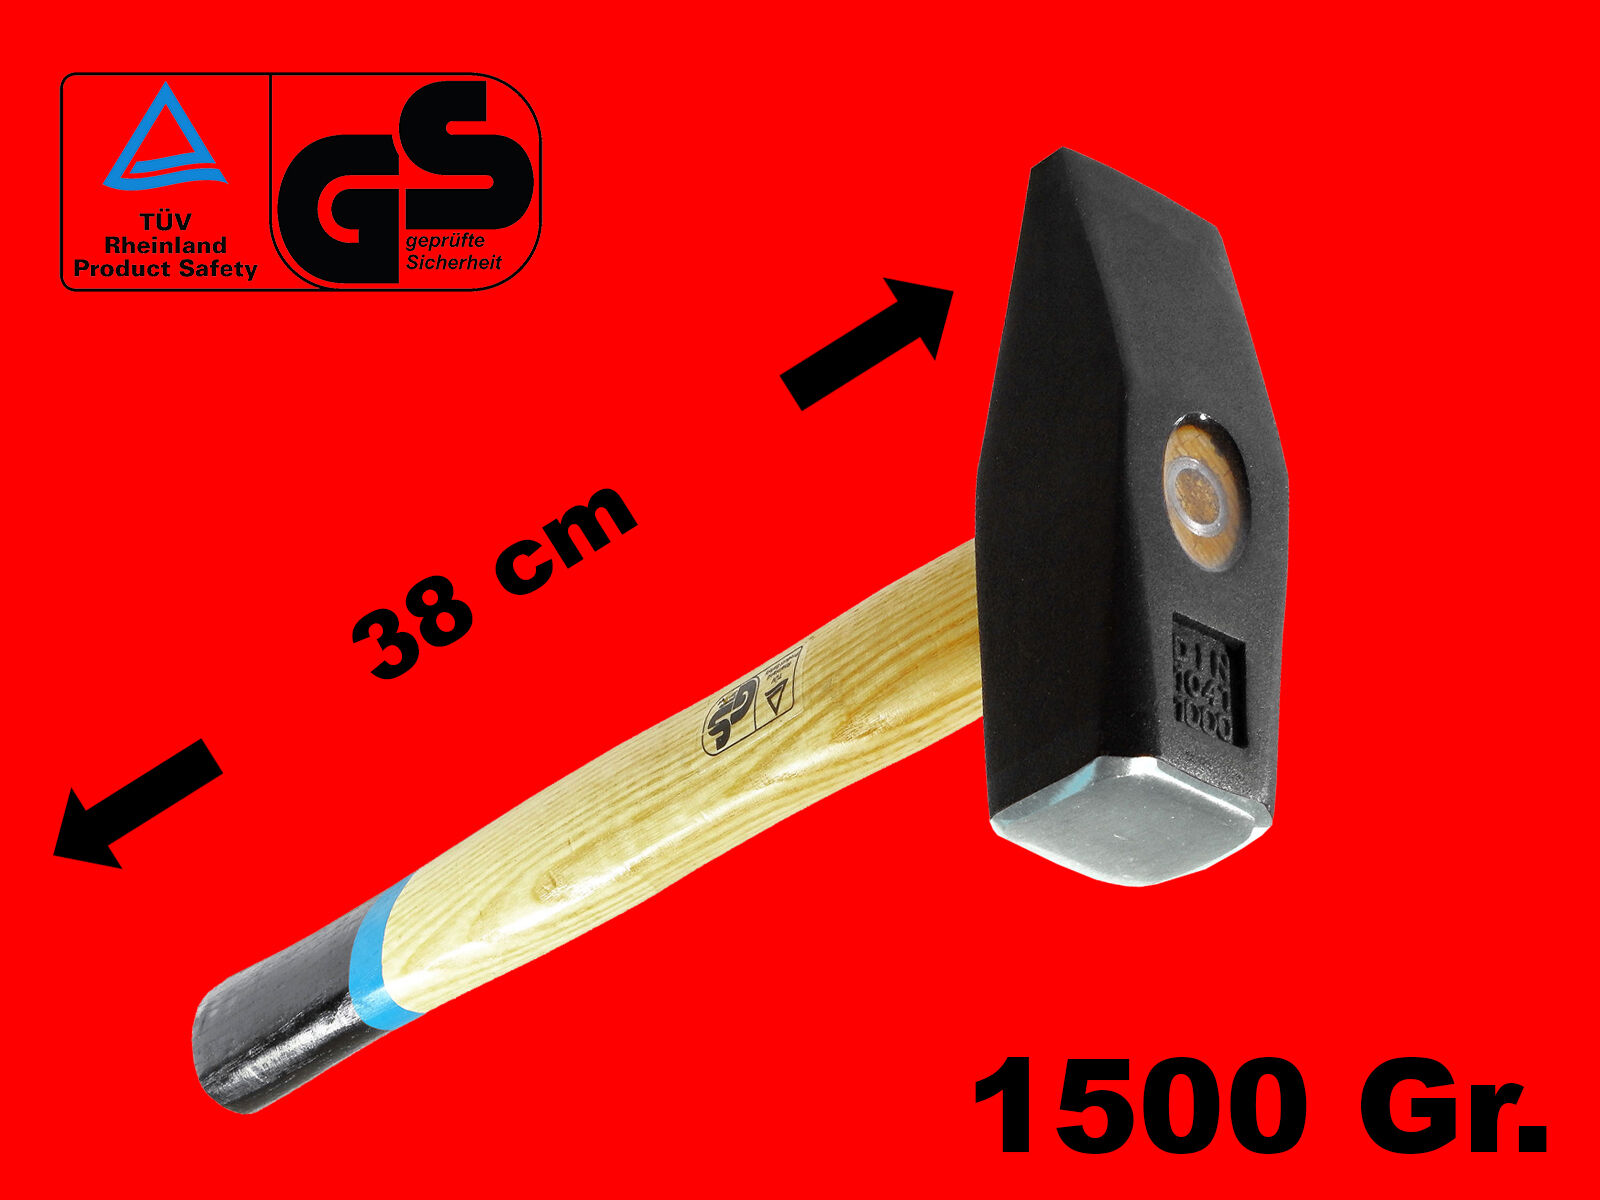 7-tlg Schlosserhammer Set 100 Gr 2000 Gr Werkstatt Hammer Esche Holzstiel XT